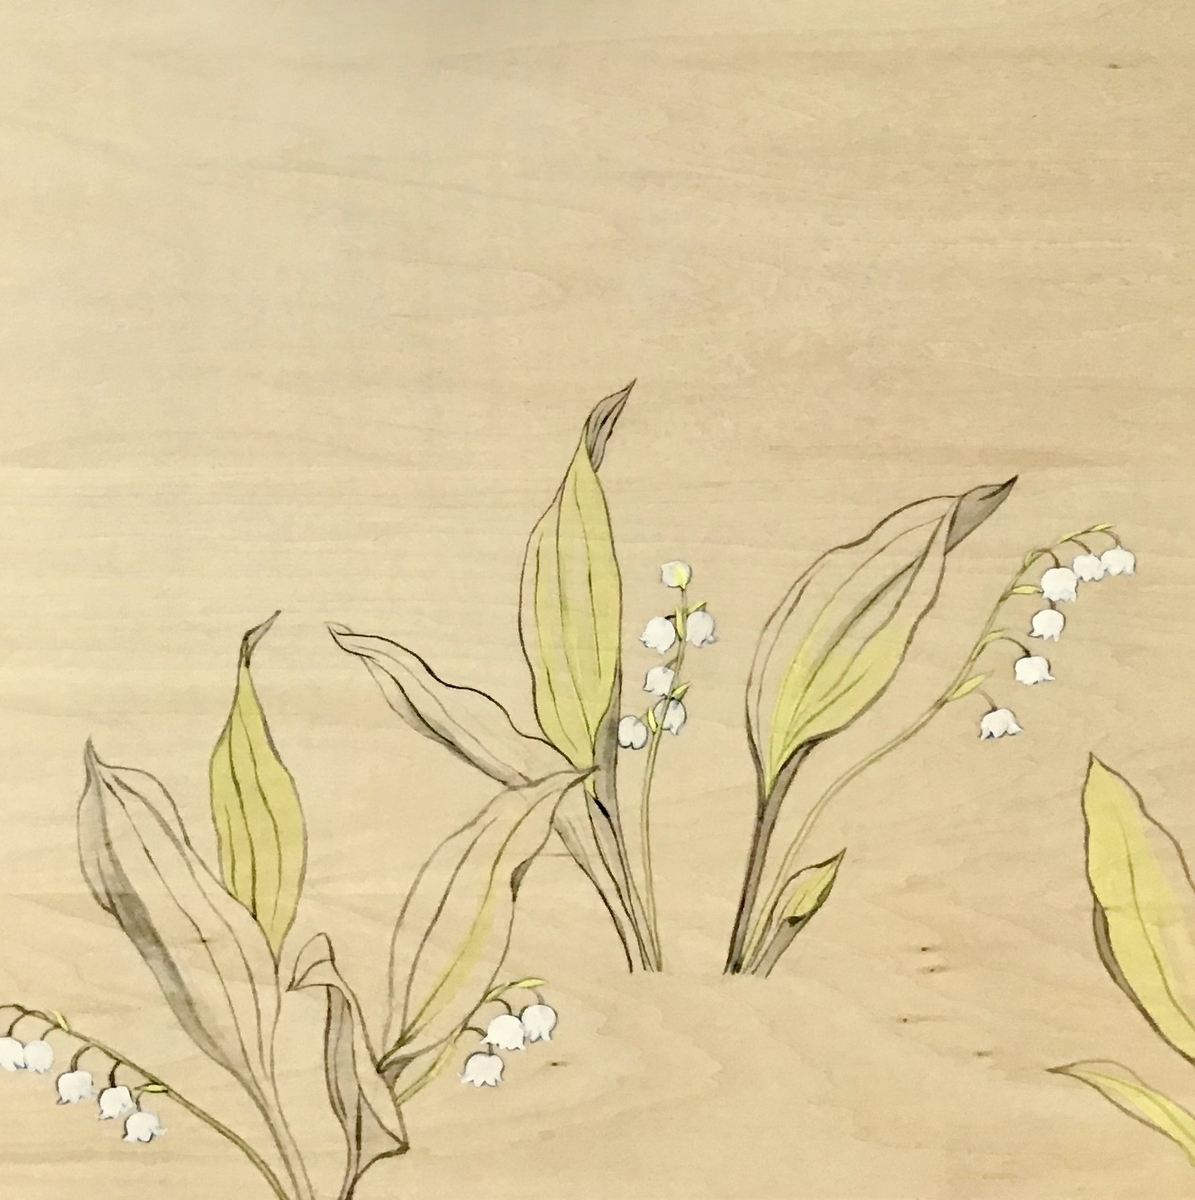 f:id:daikouji:20210613132503j:plain